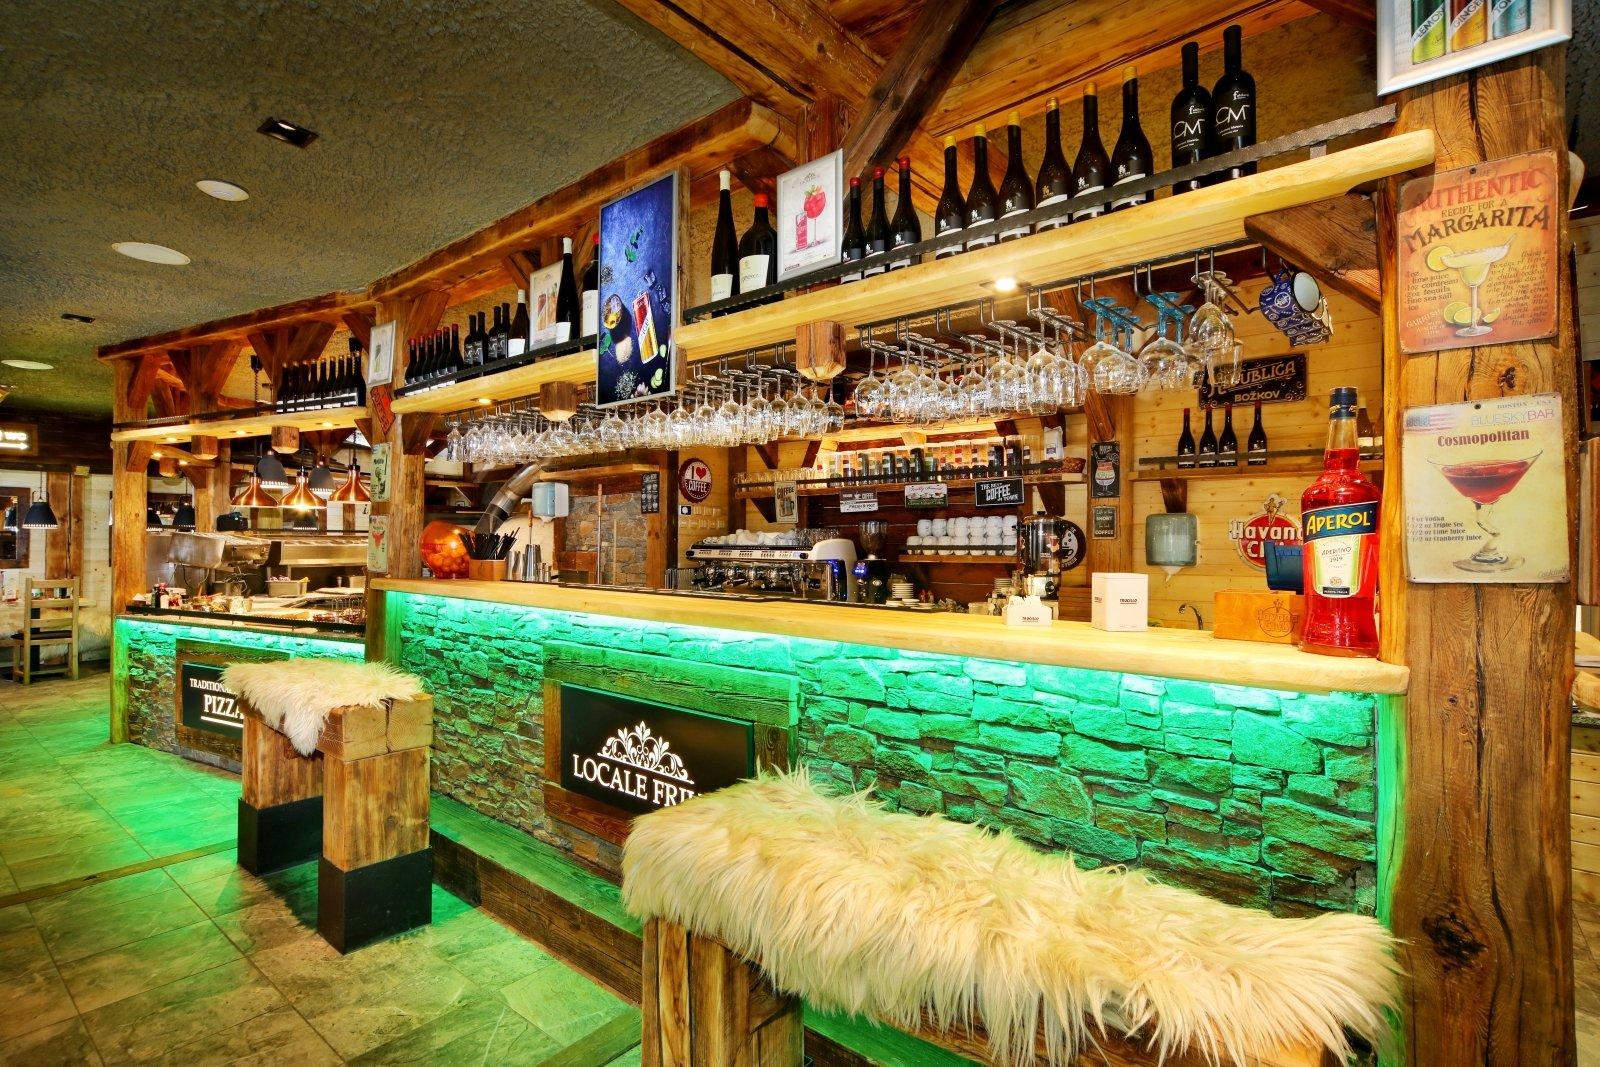 Restaurant Locale Friuli - Špindlerův Mlýn